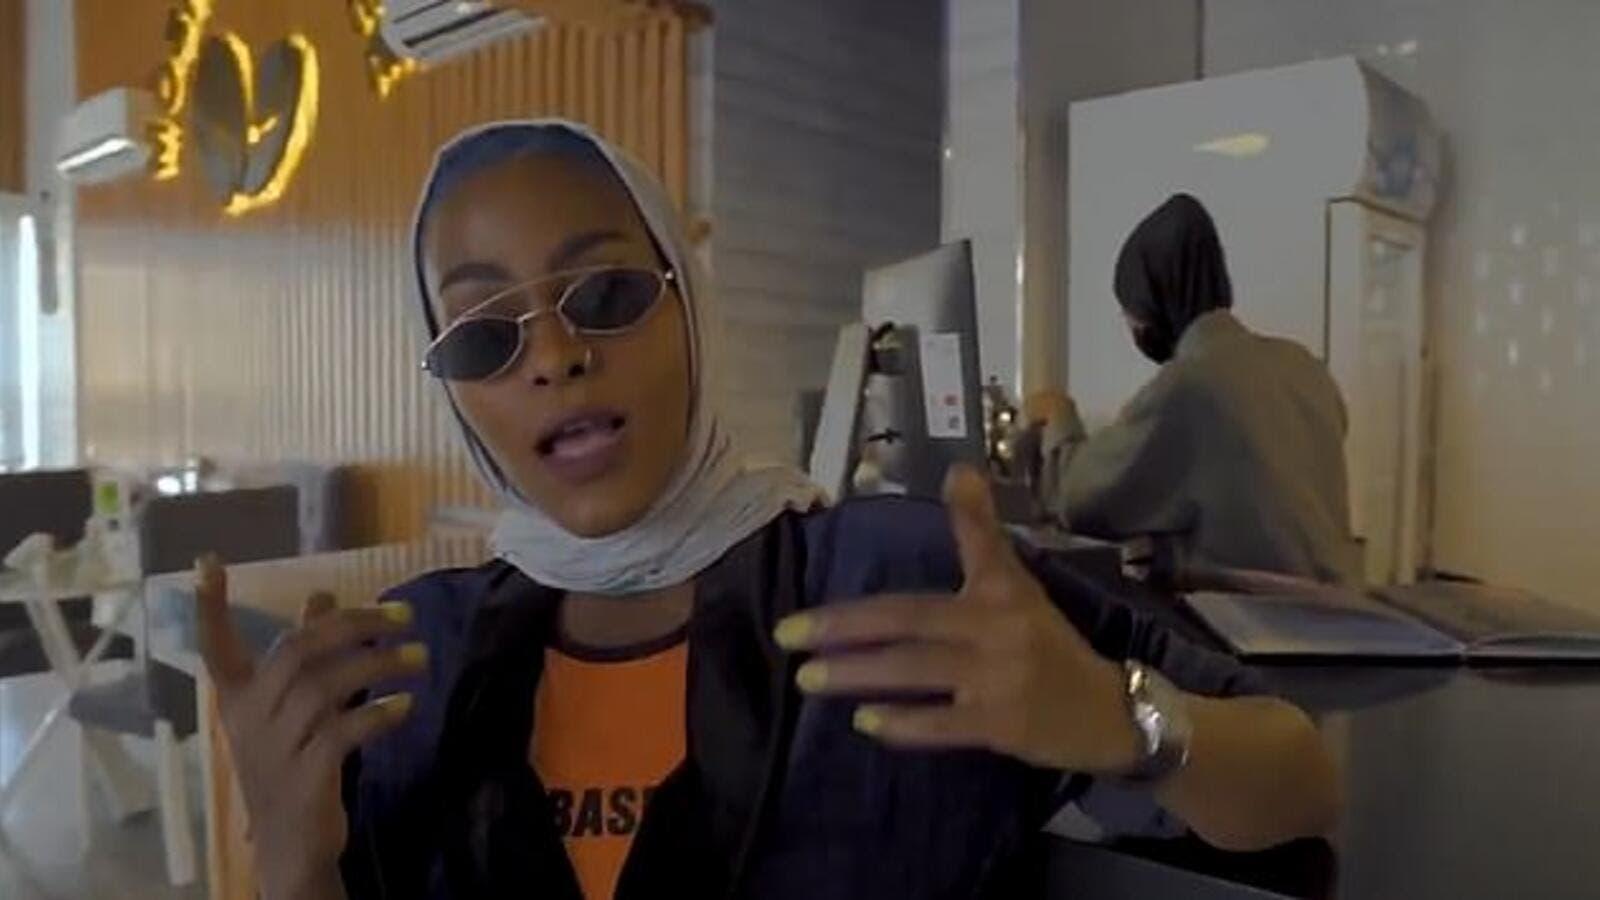 Saudi Arabian rapper facing arrest for her